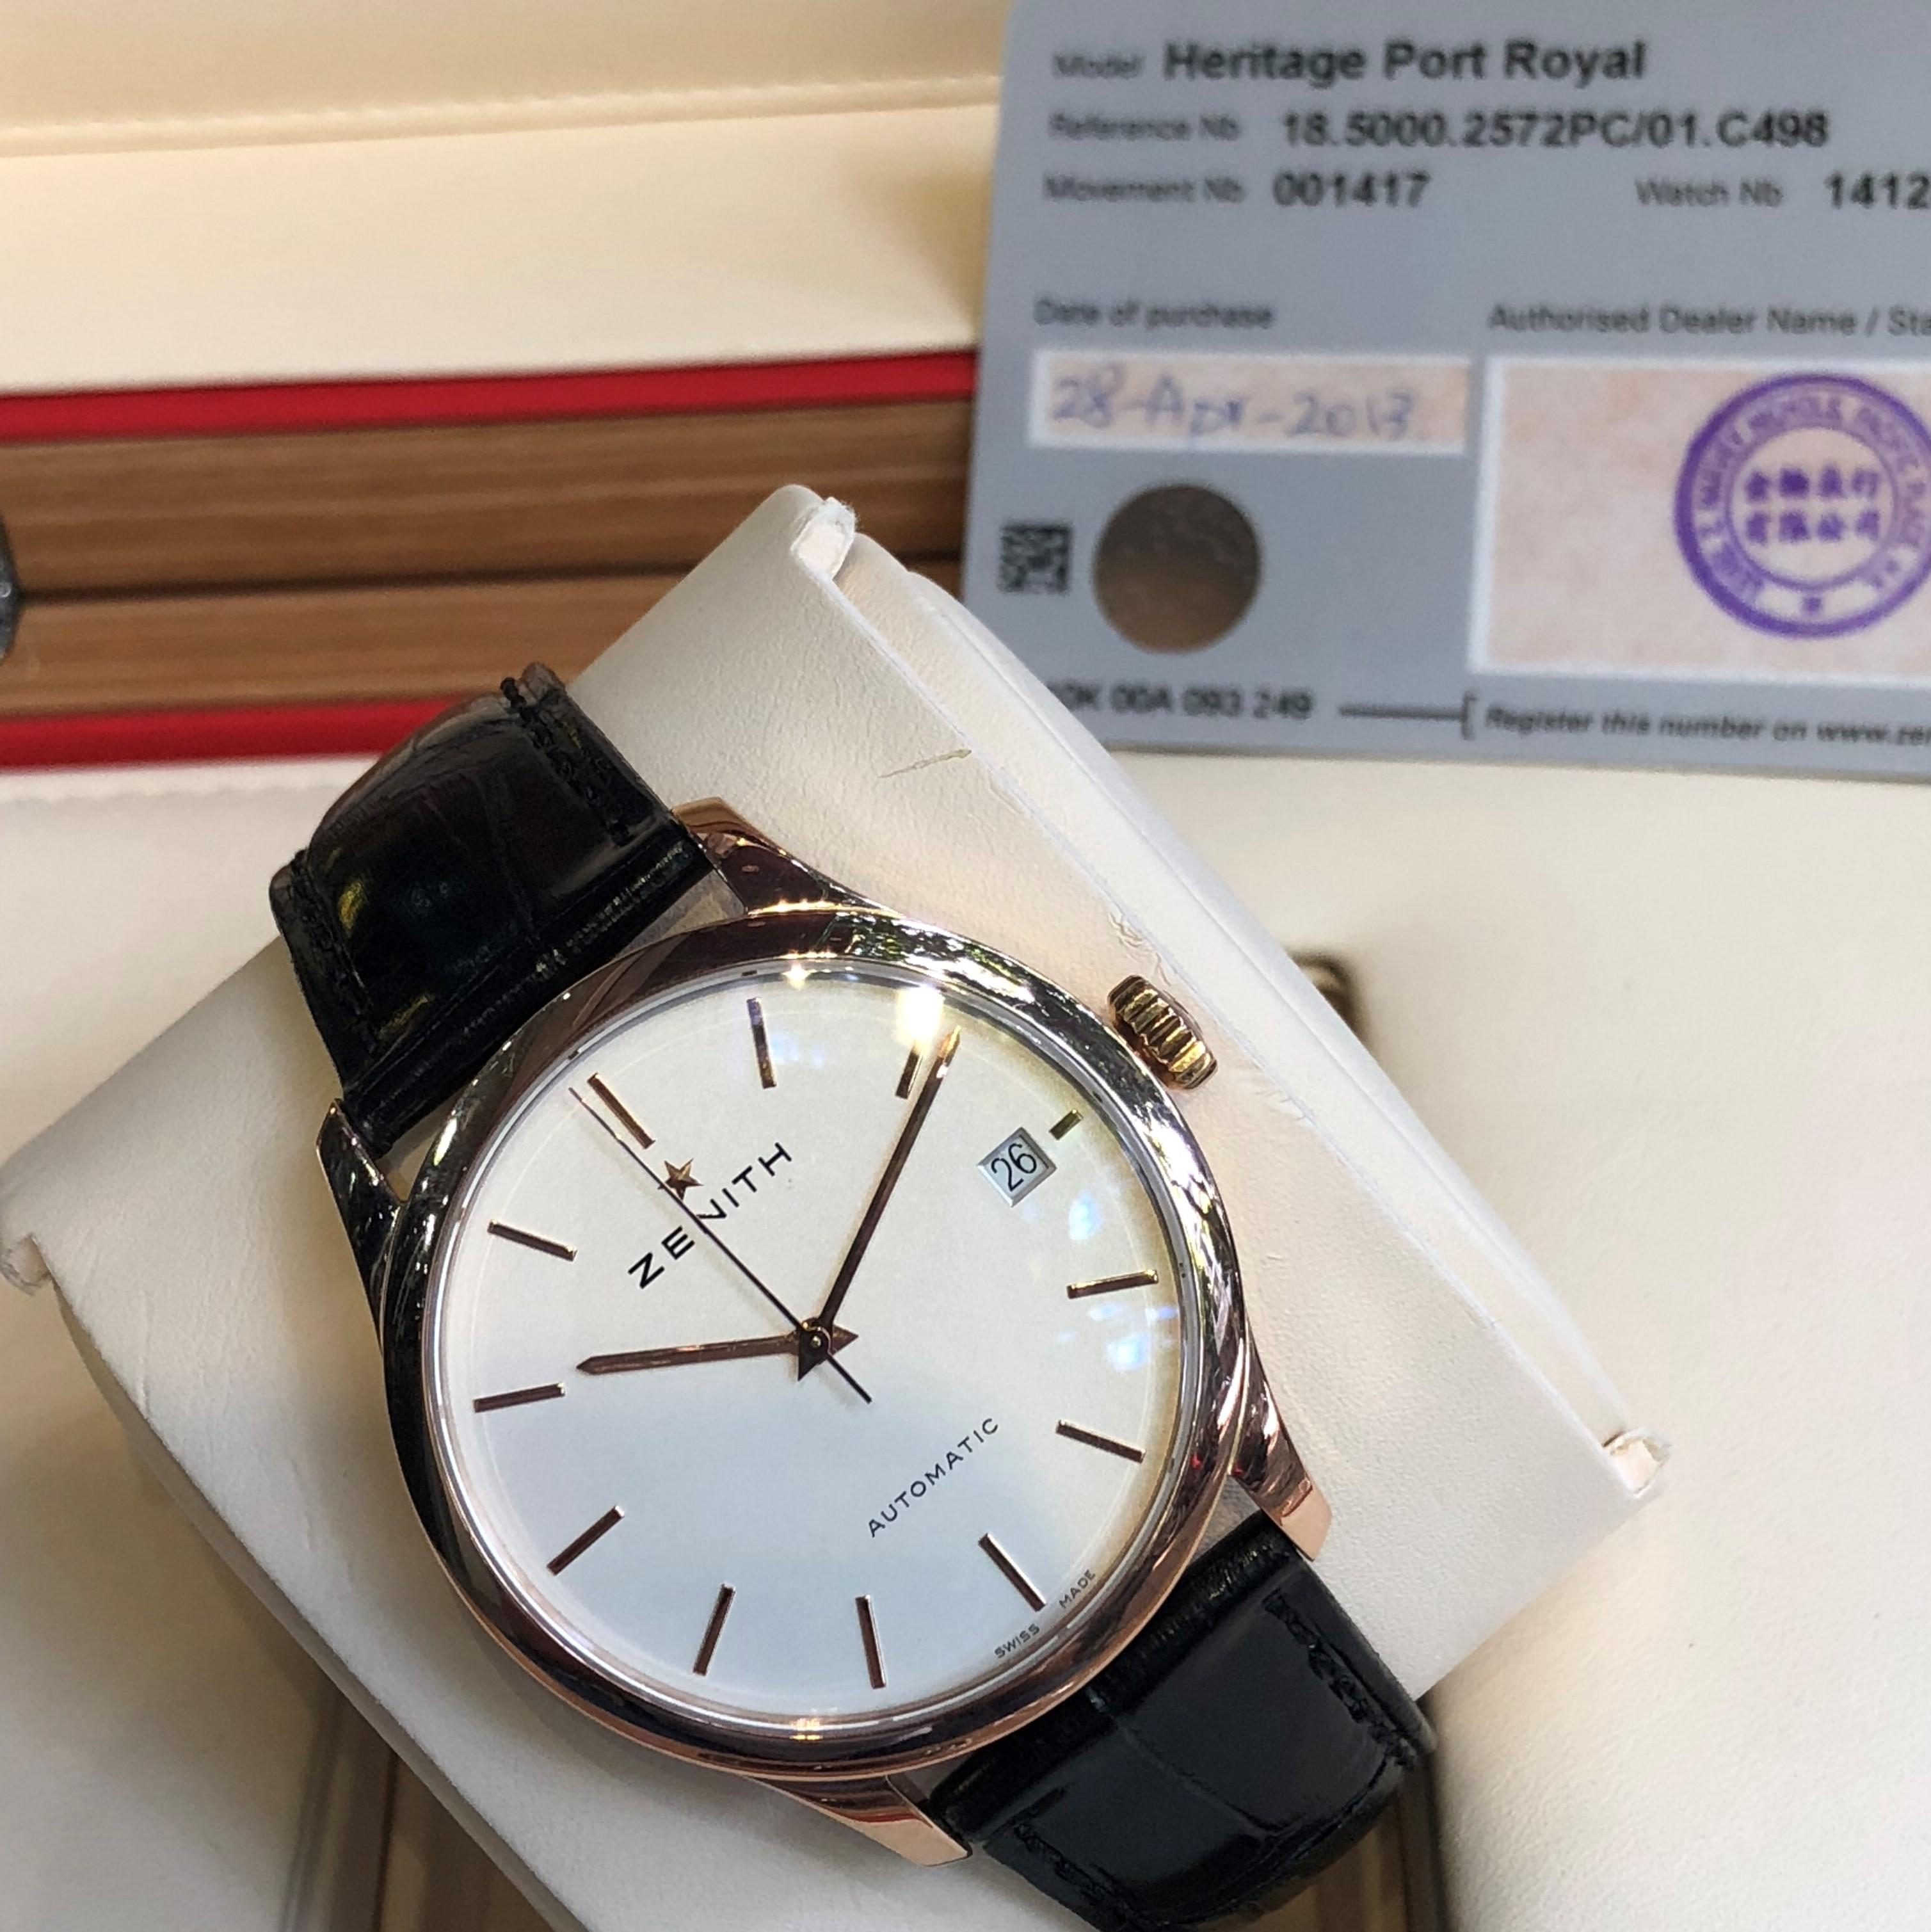 Zenith Heritage Port Royal 1850002572PC01C498 Rose Gold